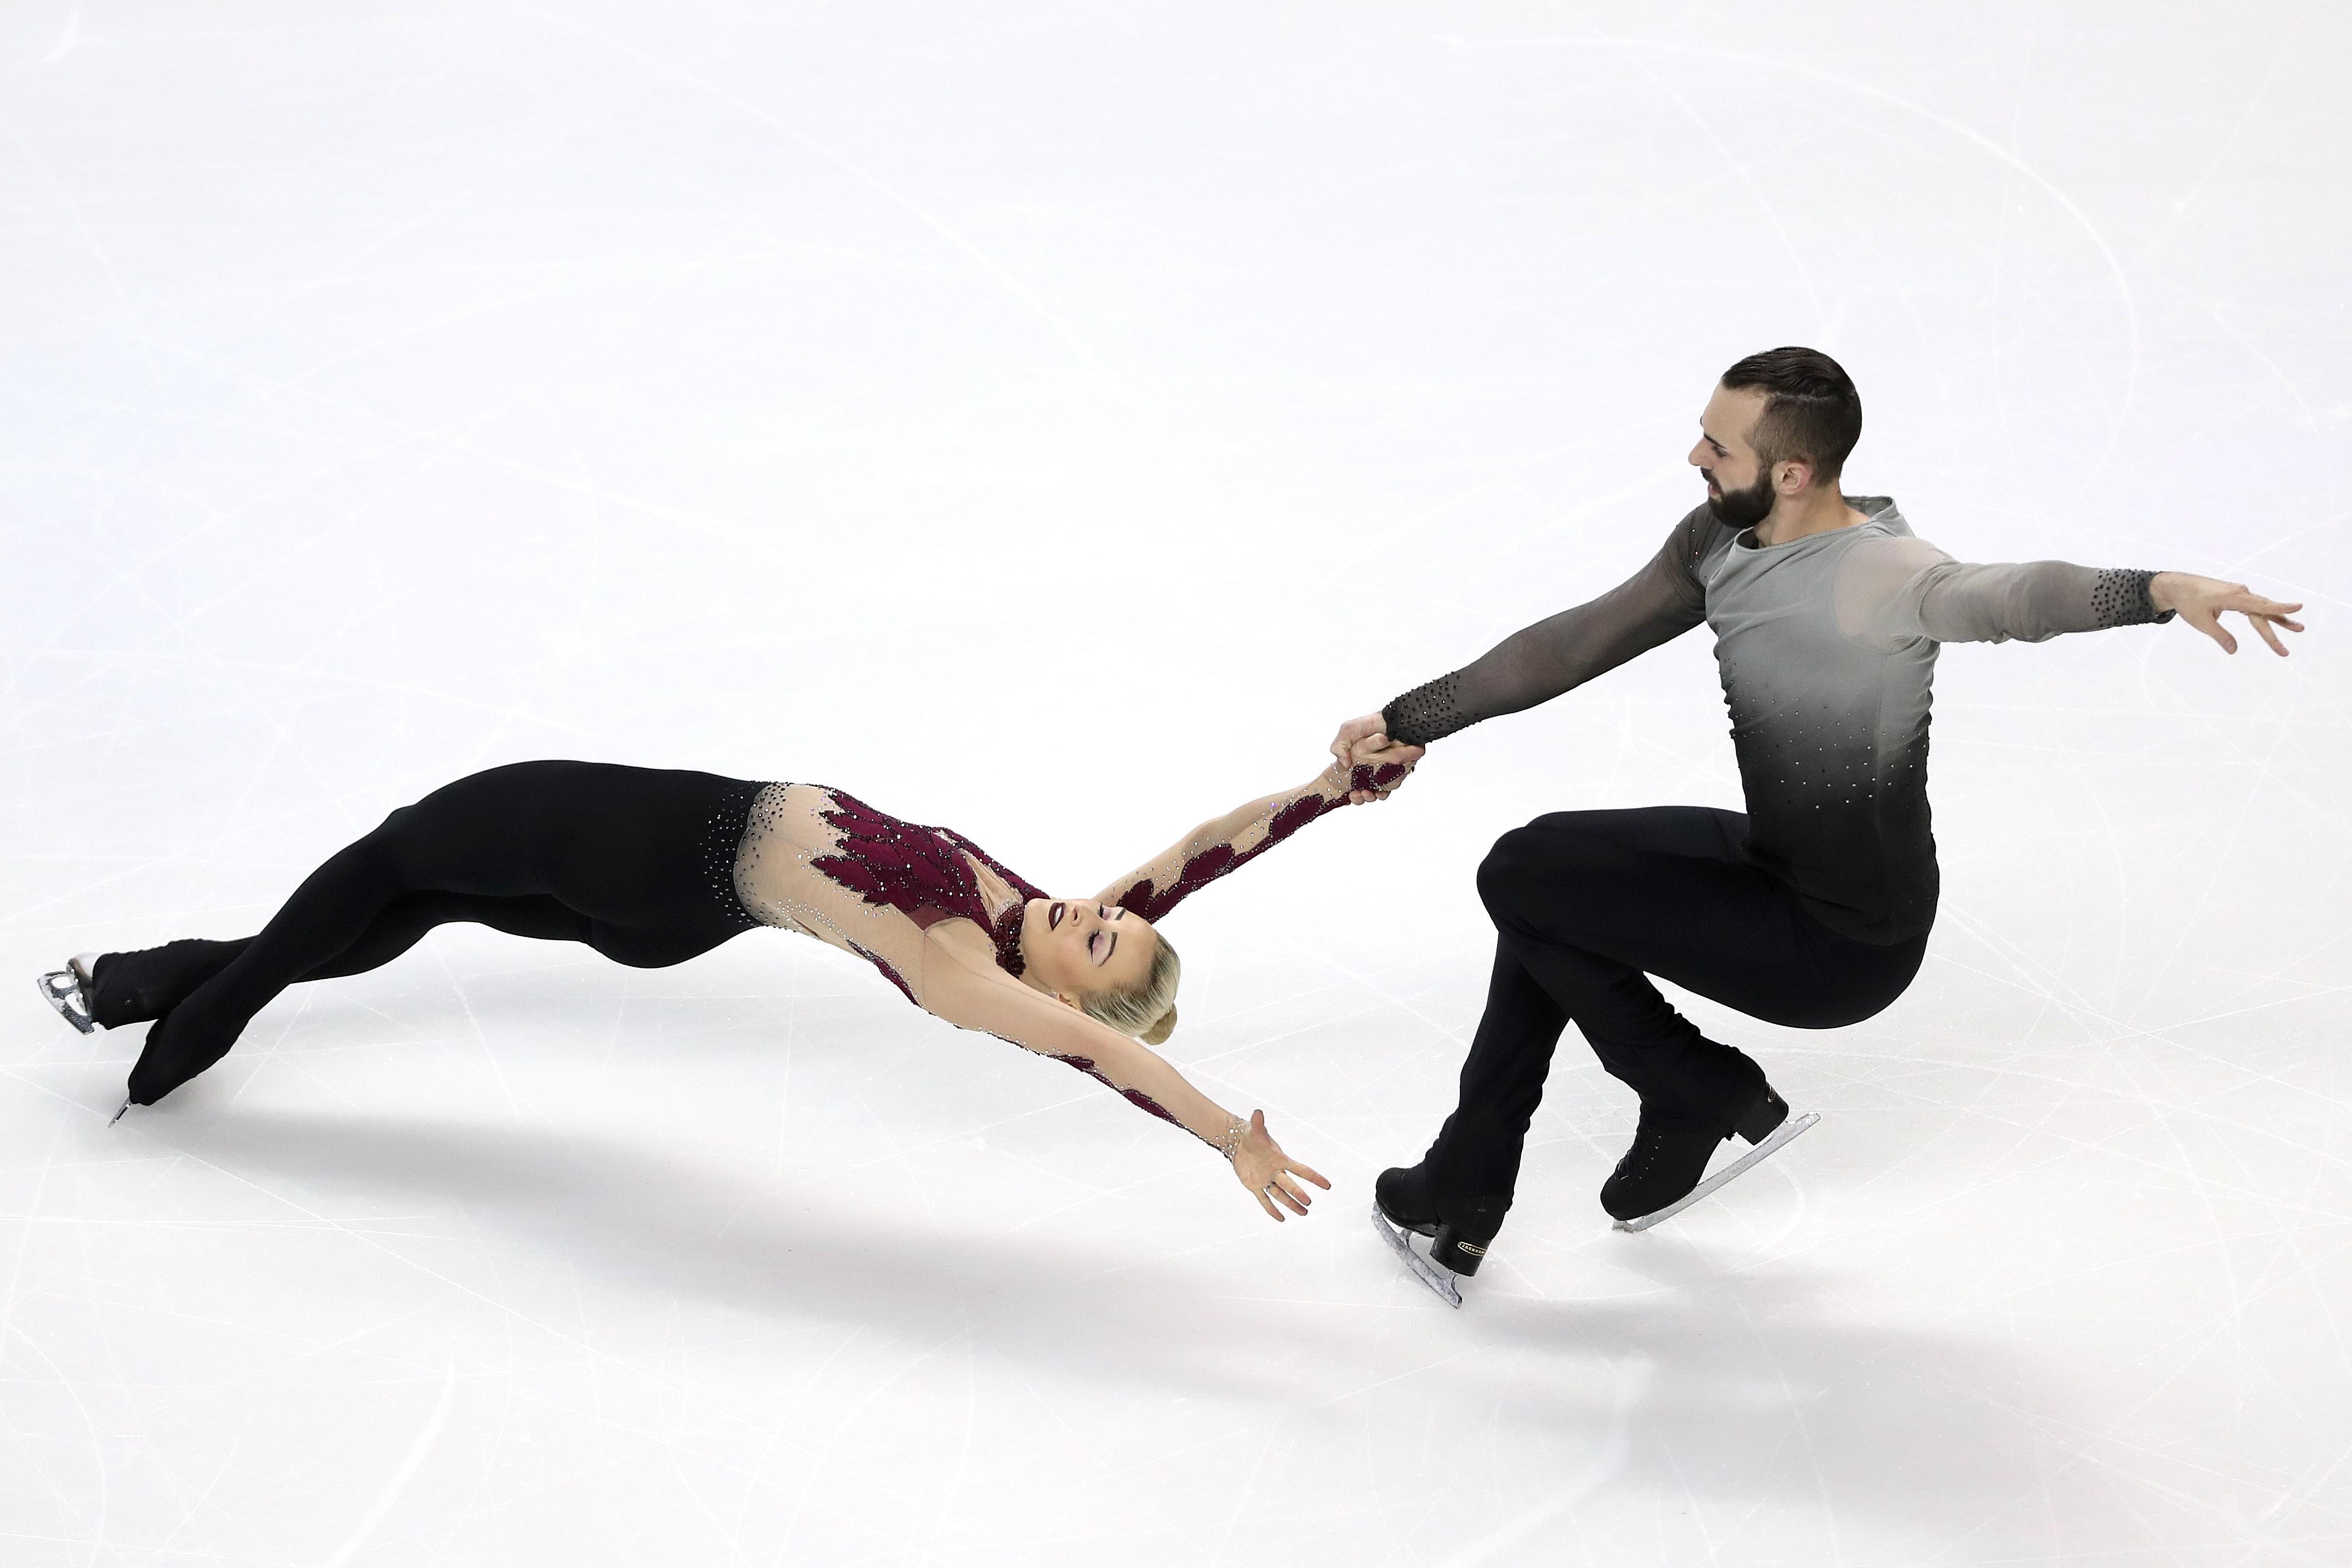 2020 U.S. Figure Skating Championships - Day 4